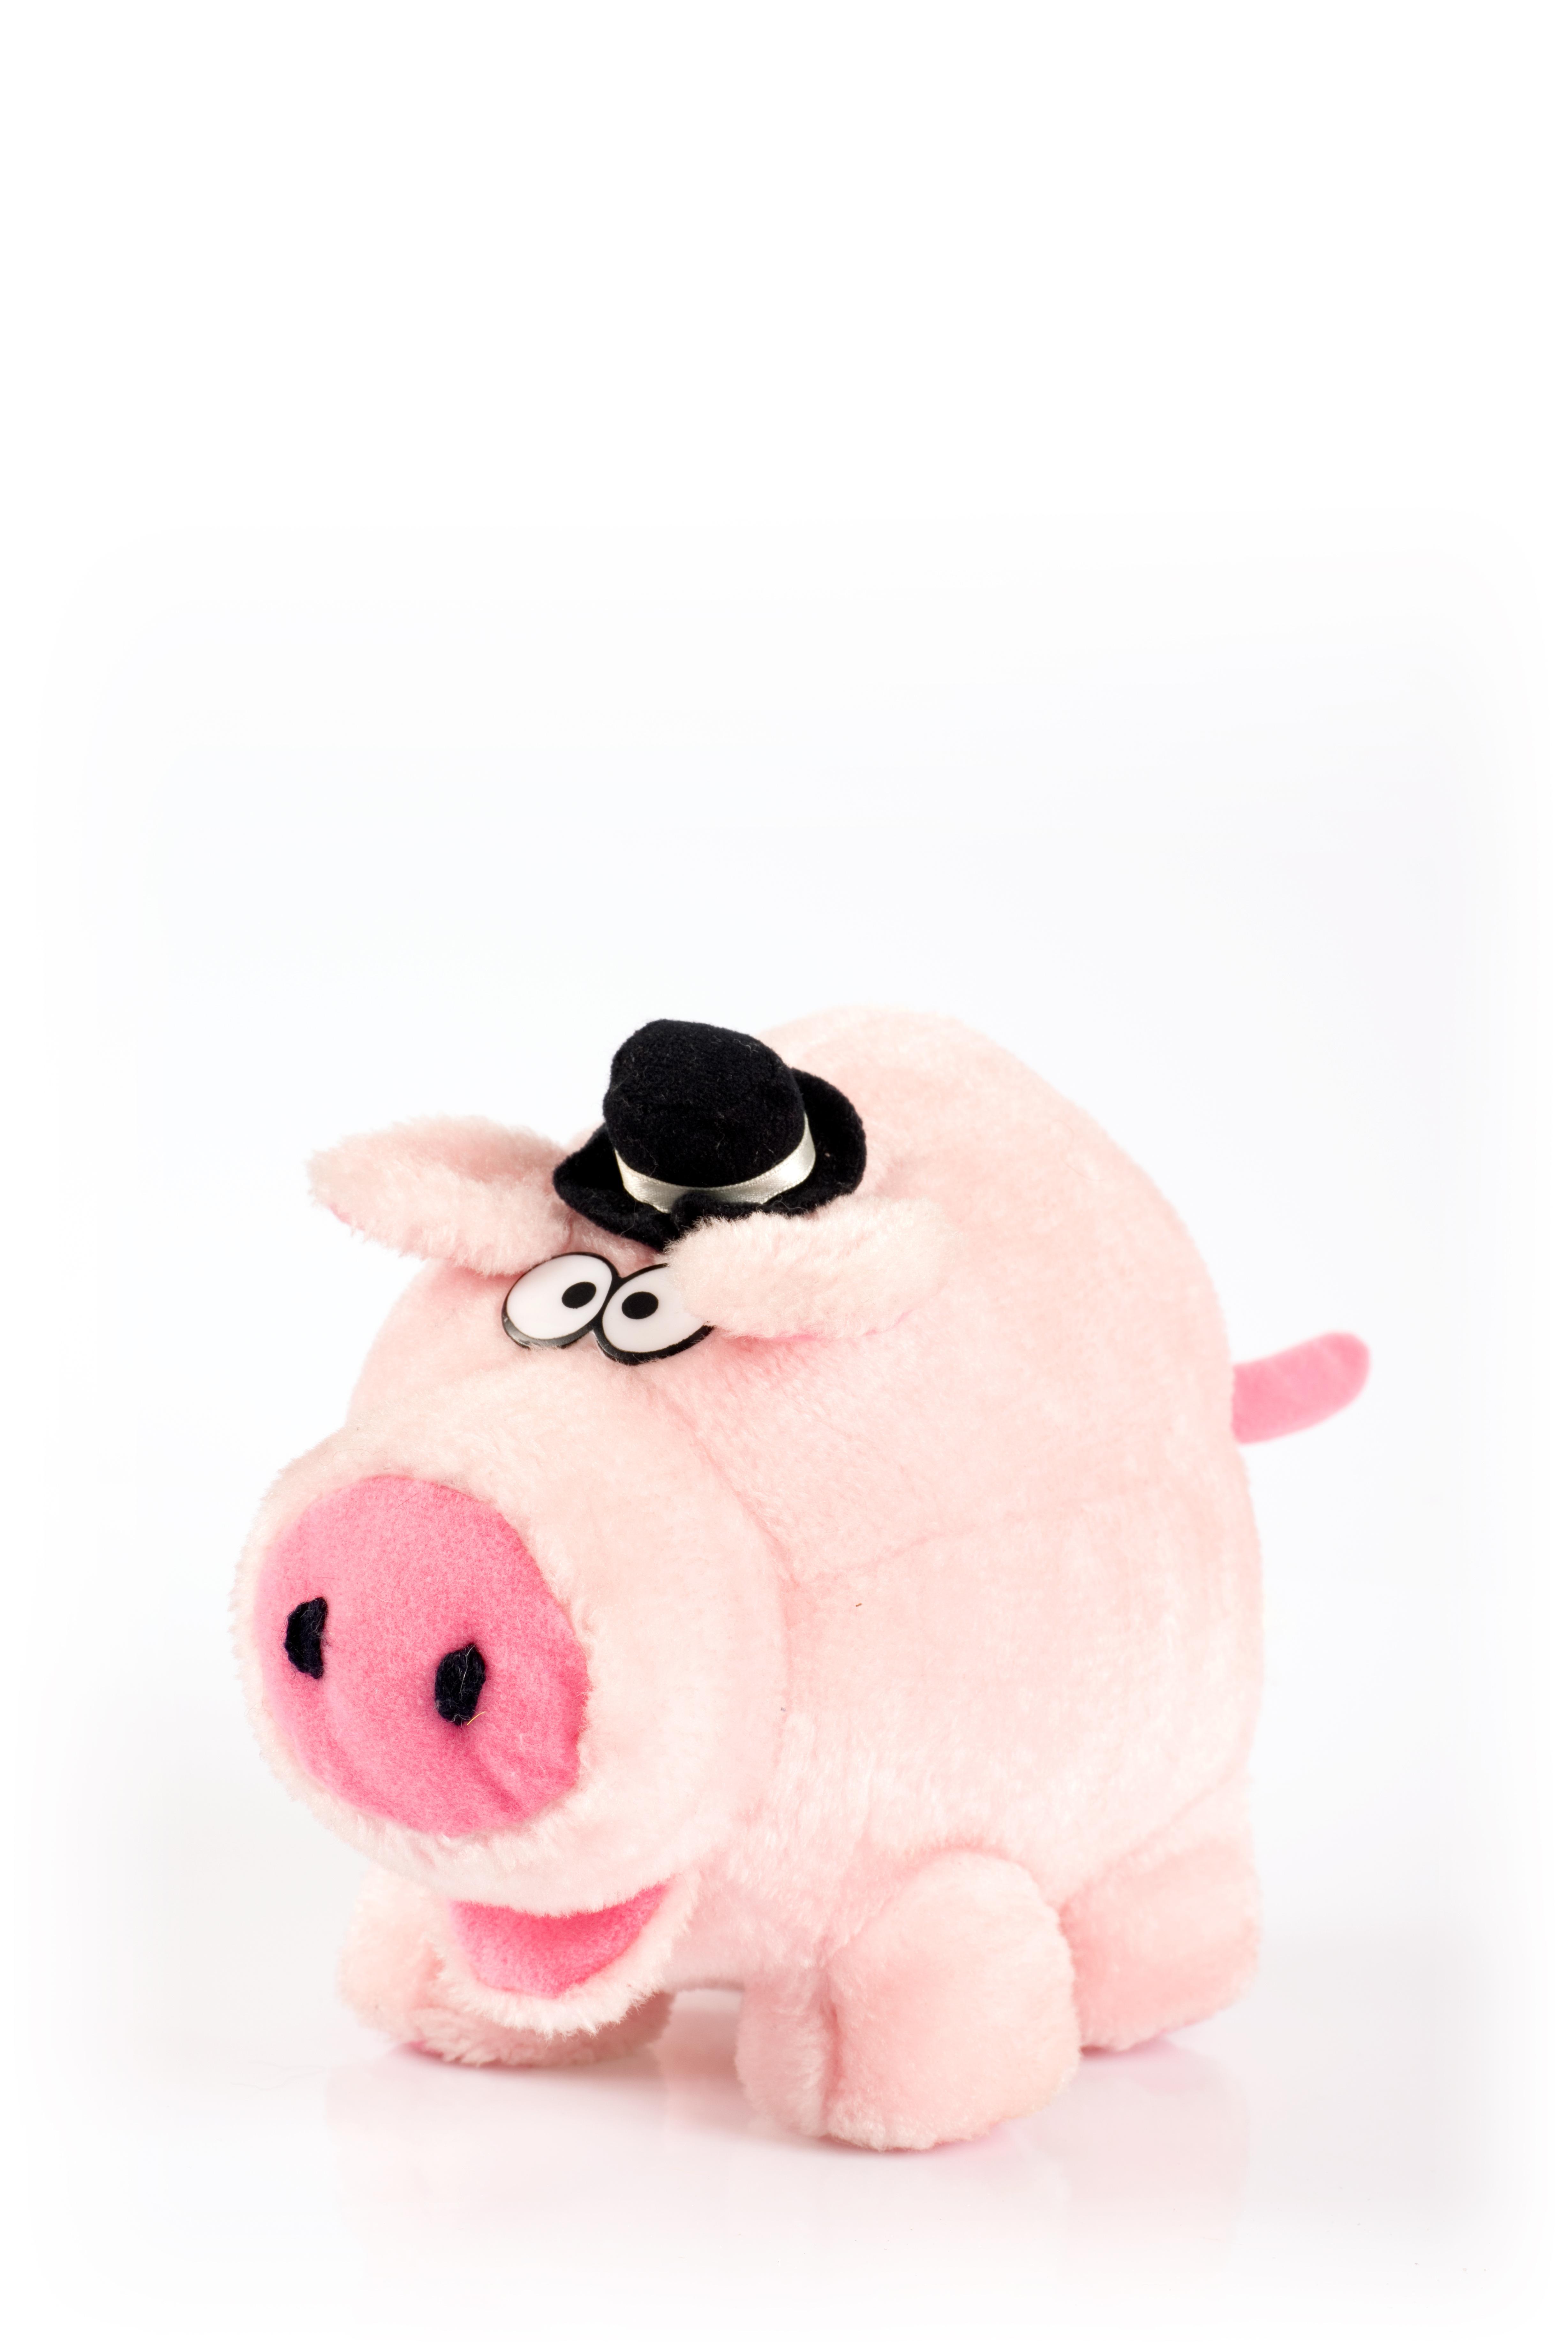 Fotos gratis : sombrero, rosado, juguete, material, producto, textil ...